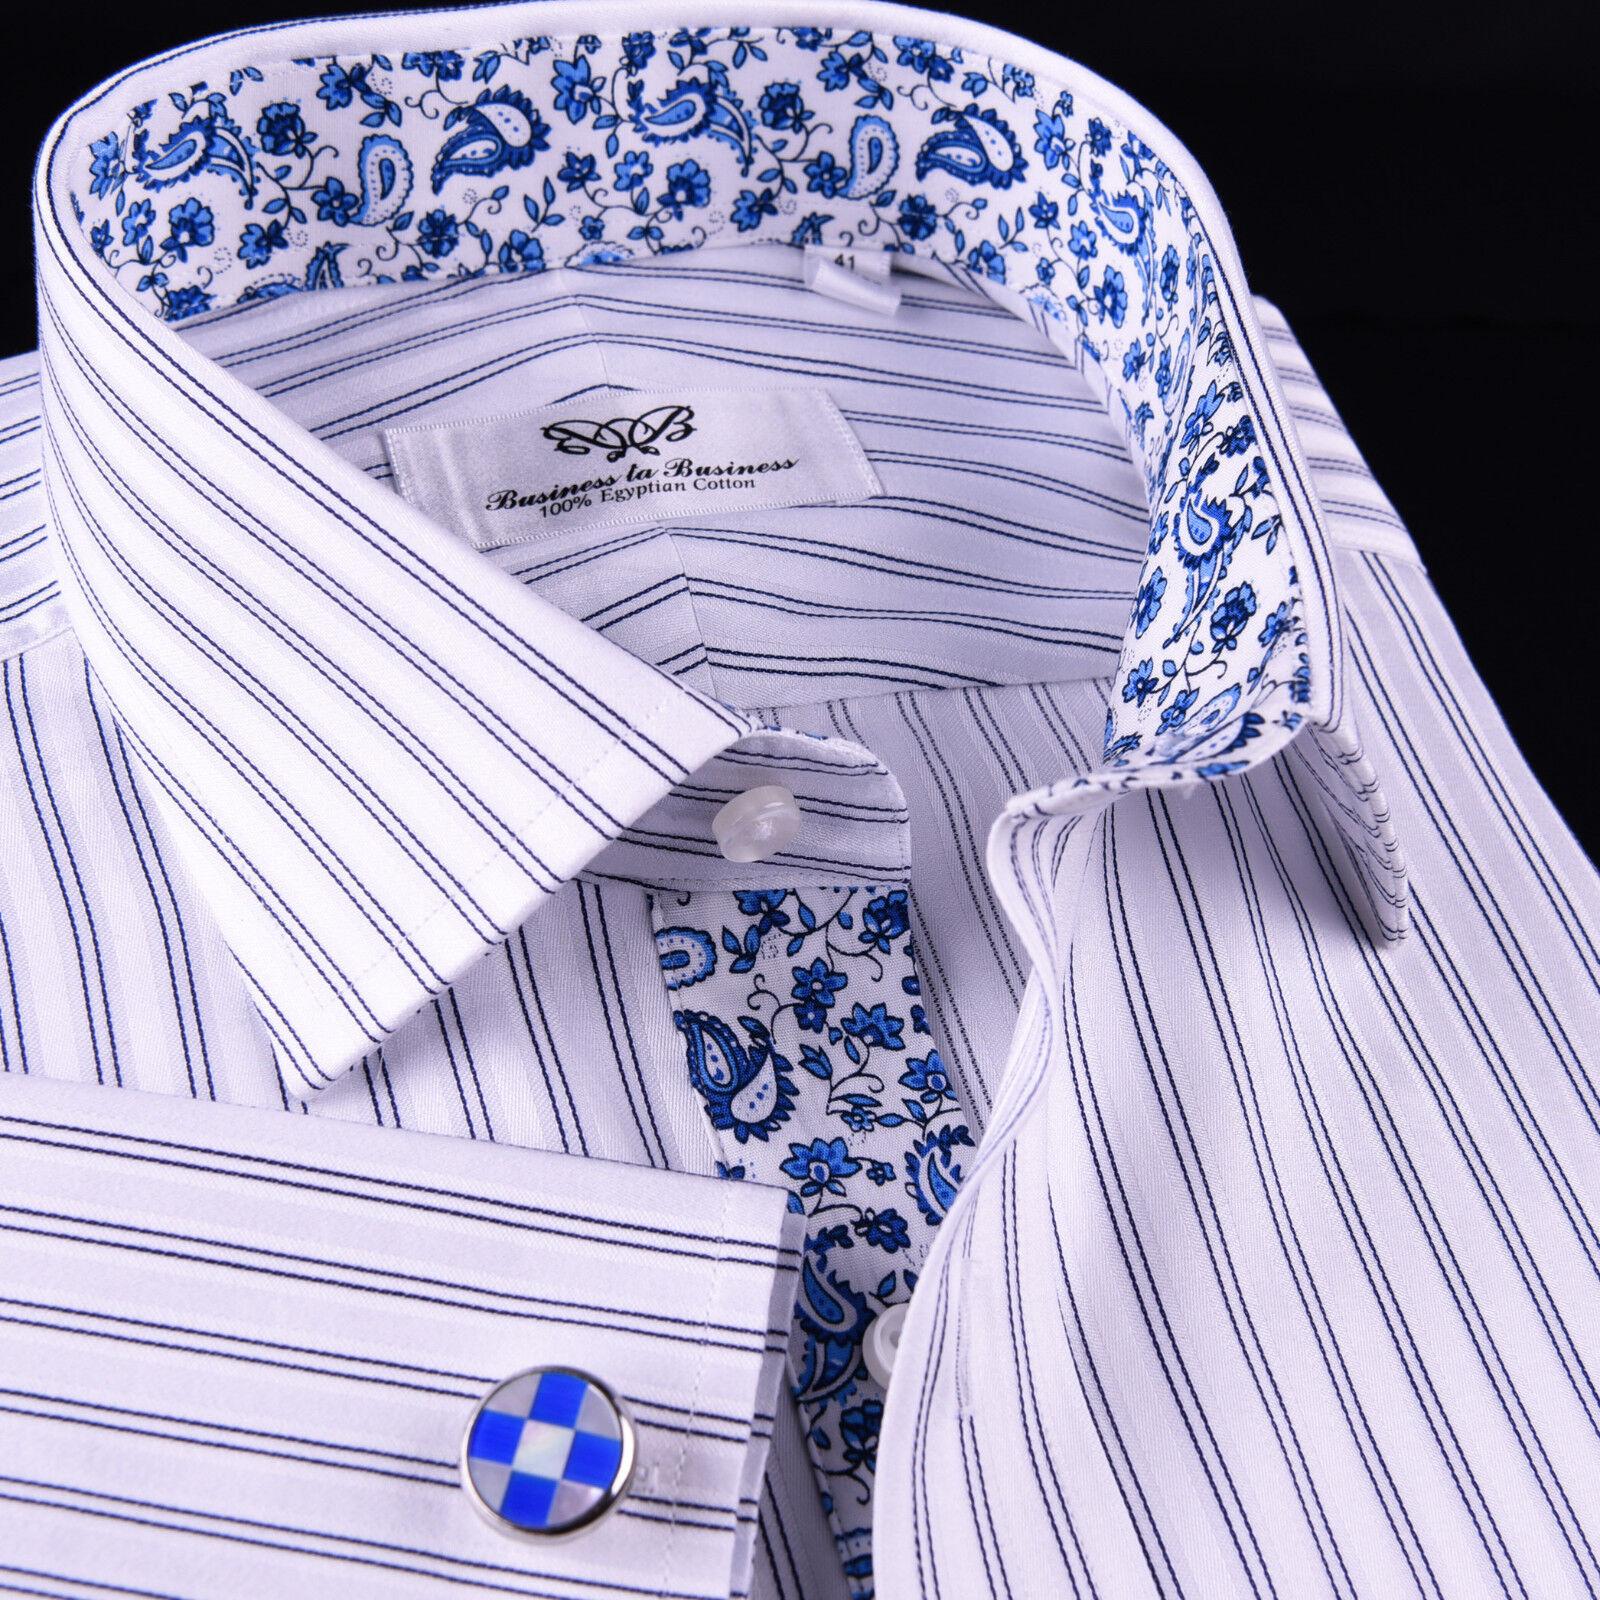 Blau Dual Stripes Formal Business Dress hemd Paisley Floral Designer Fashion GQ